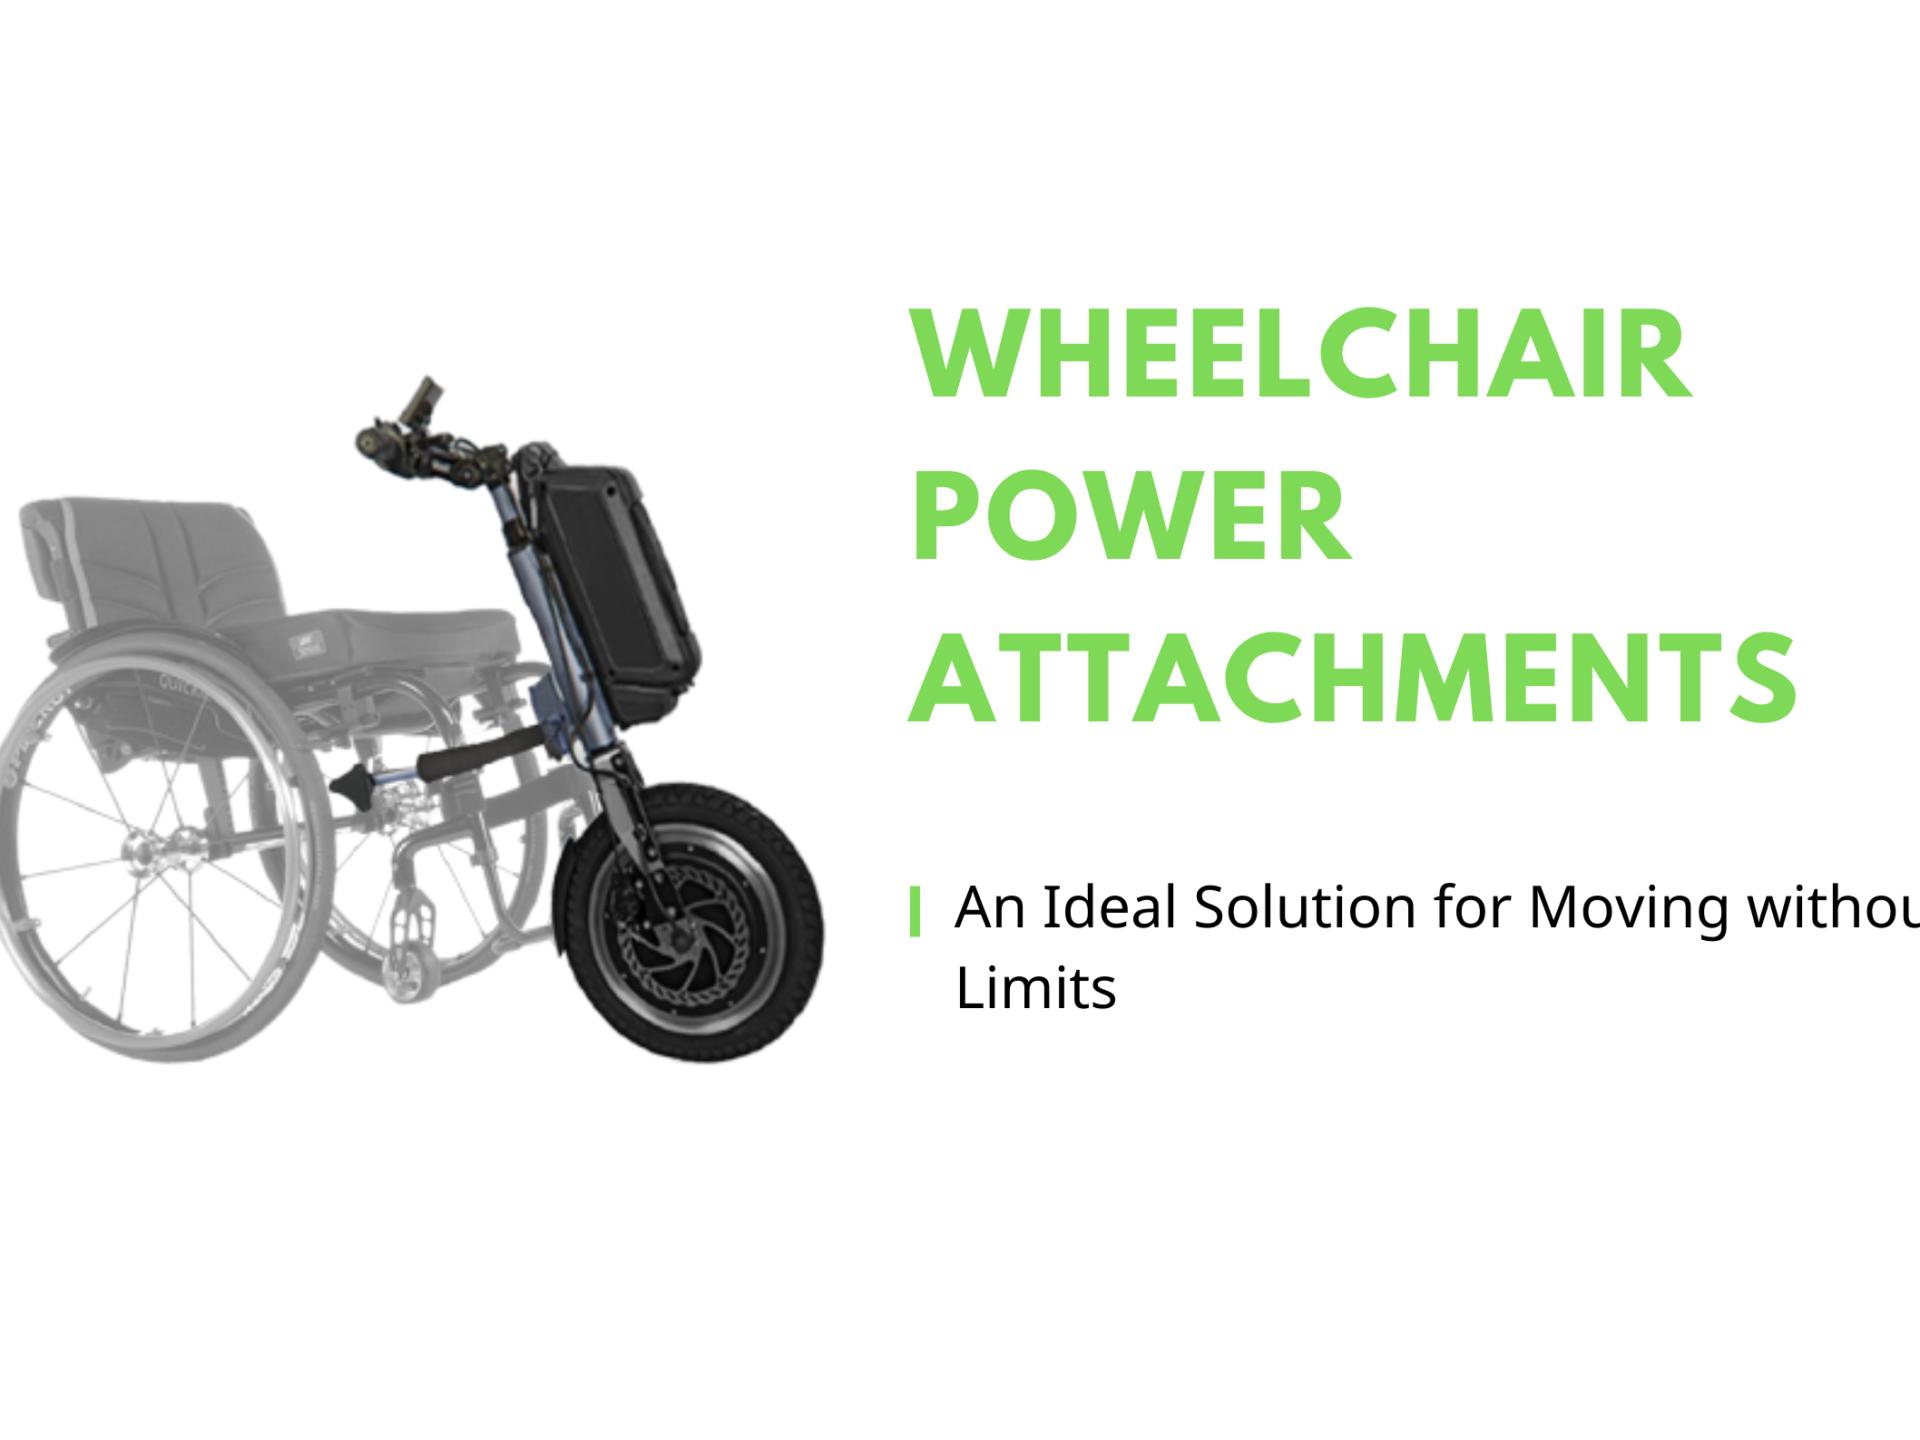 Wheelchair Power Attachments